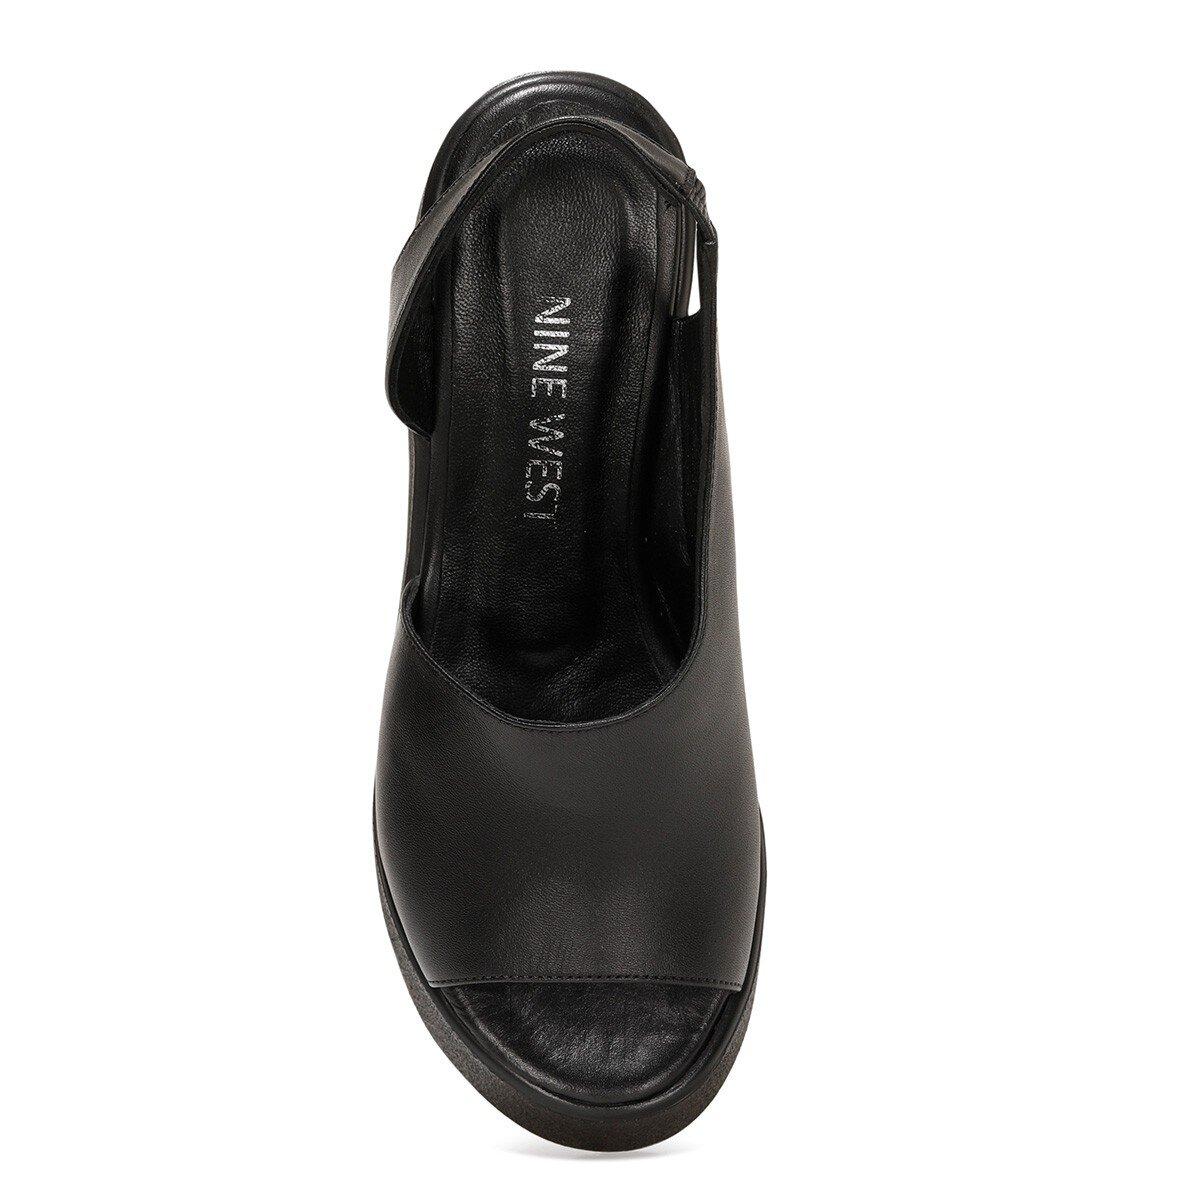 SANTEYOUNG 1FX Siyah Kadın Dolgu Topuklu Sandalet